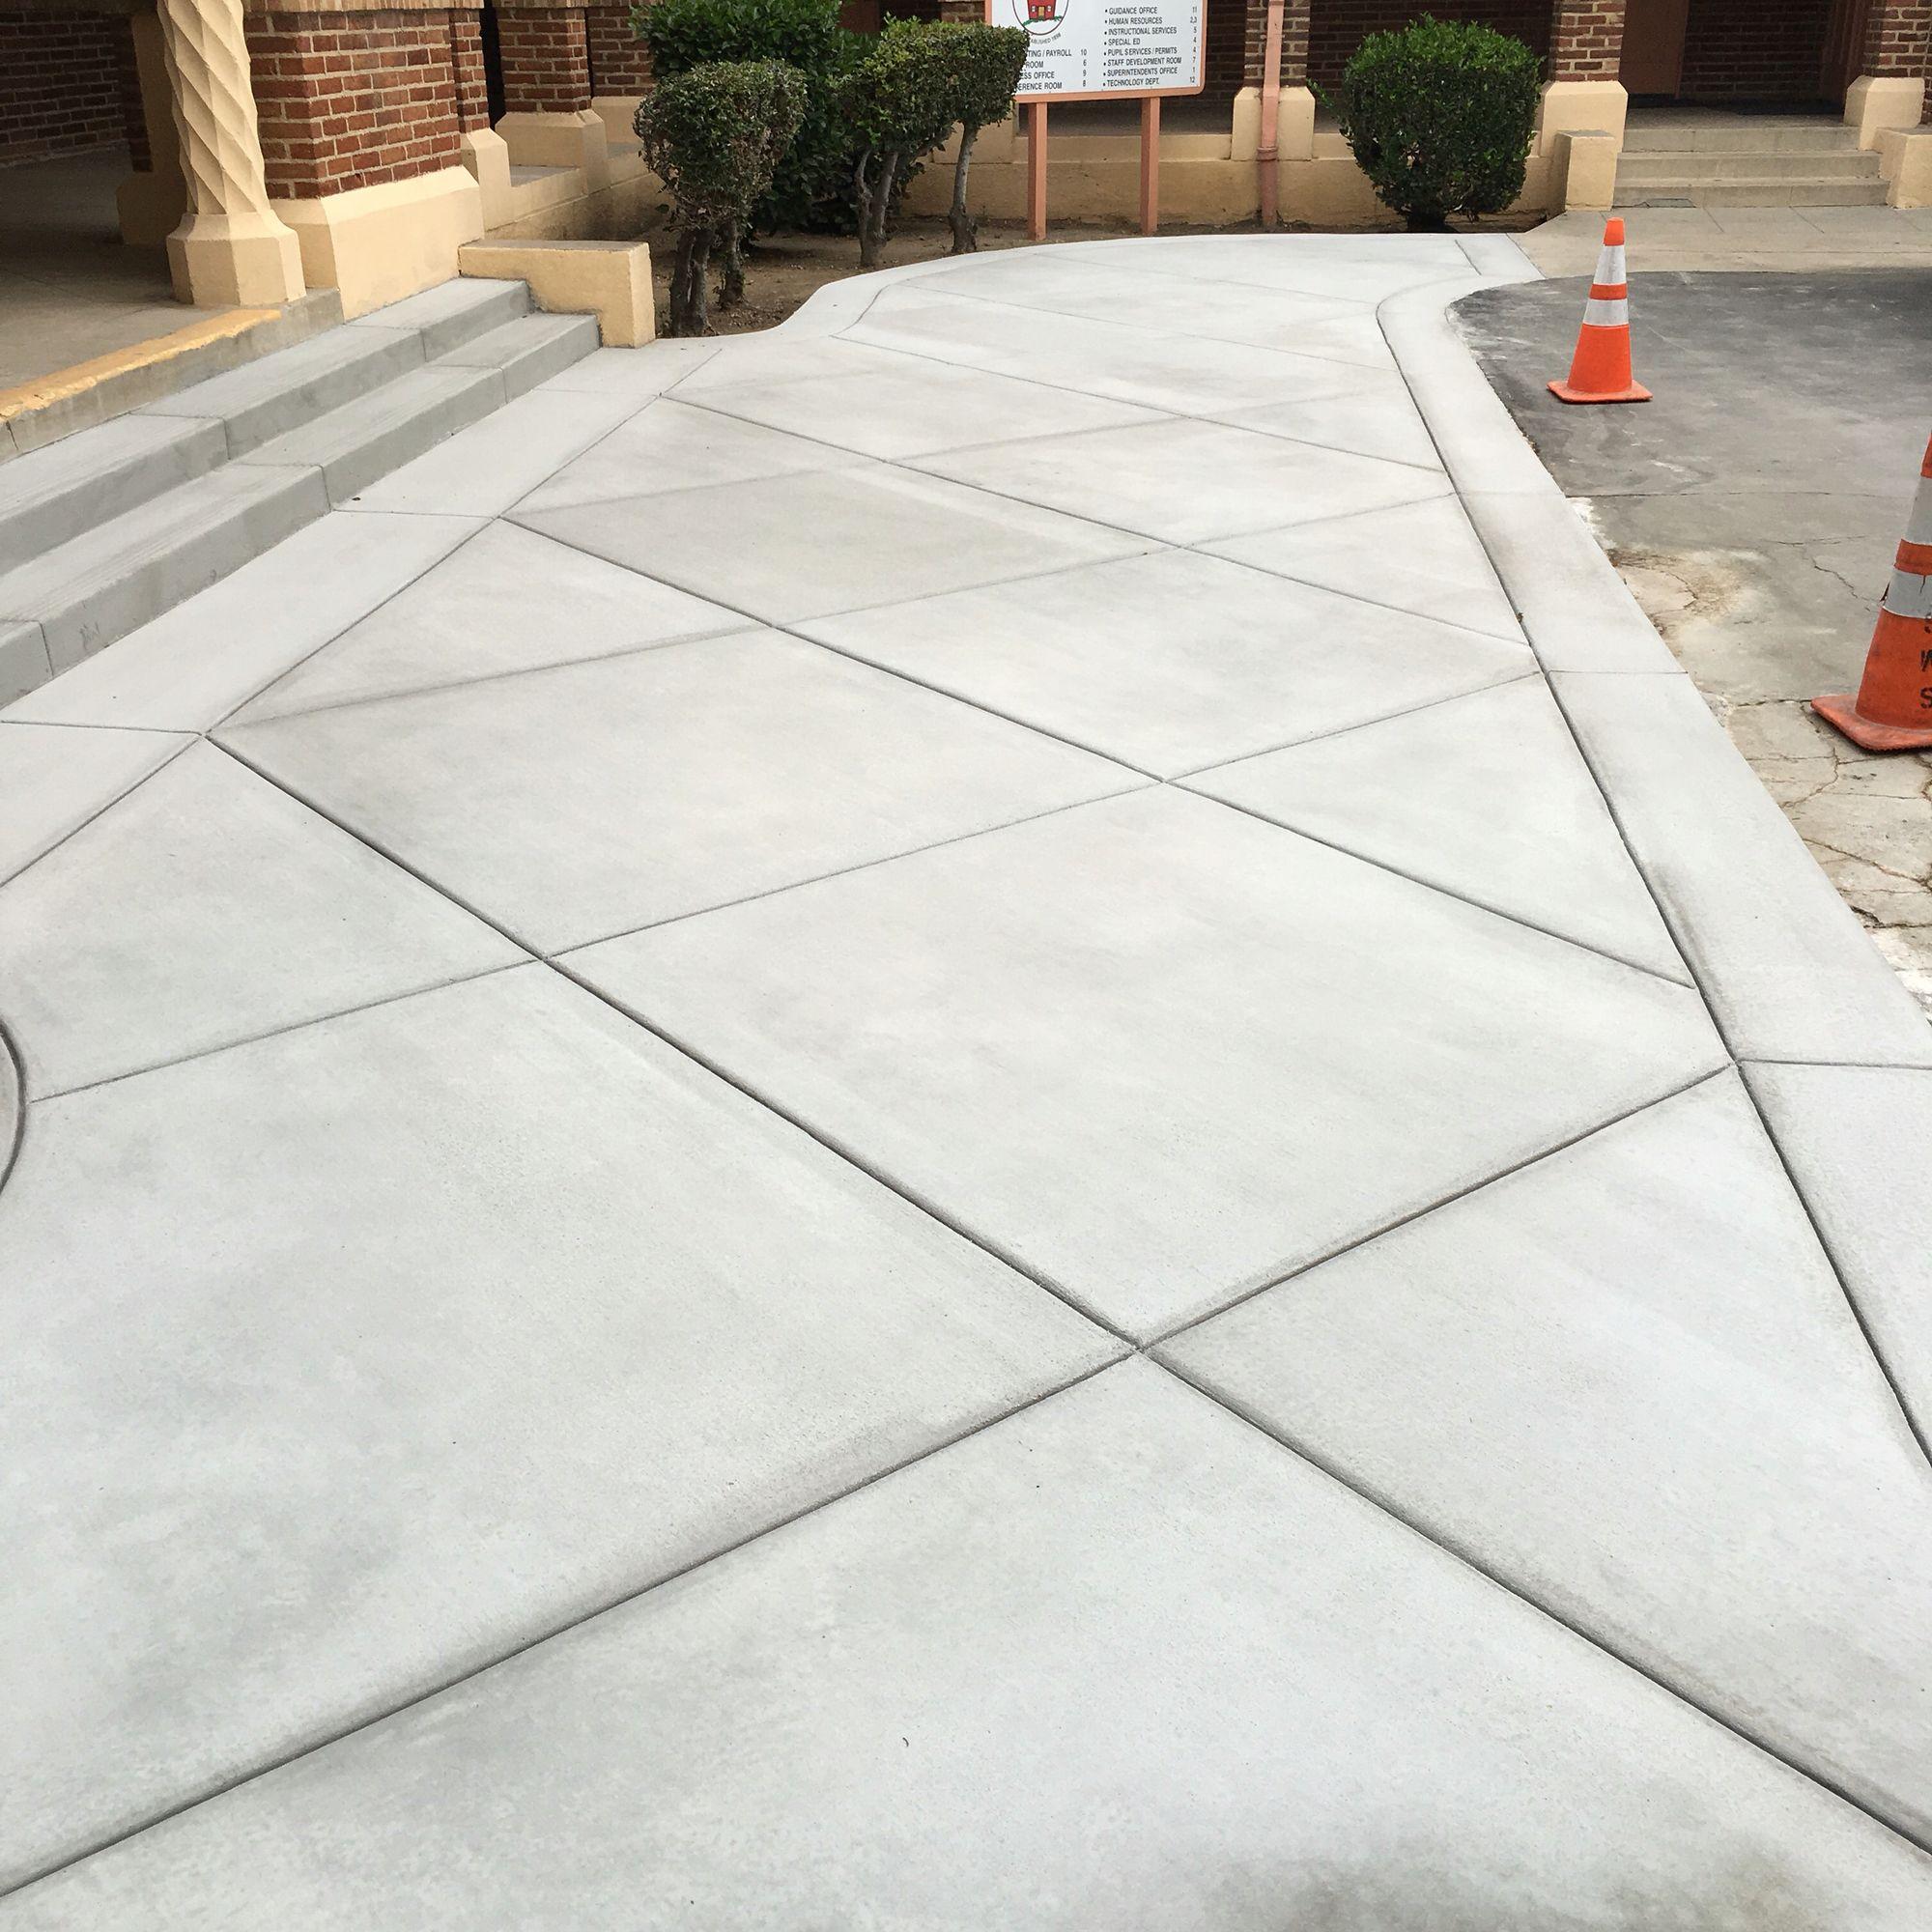 Concrete Work Concrete Patio Designs Stamped Concrete Patio